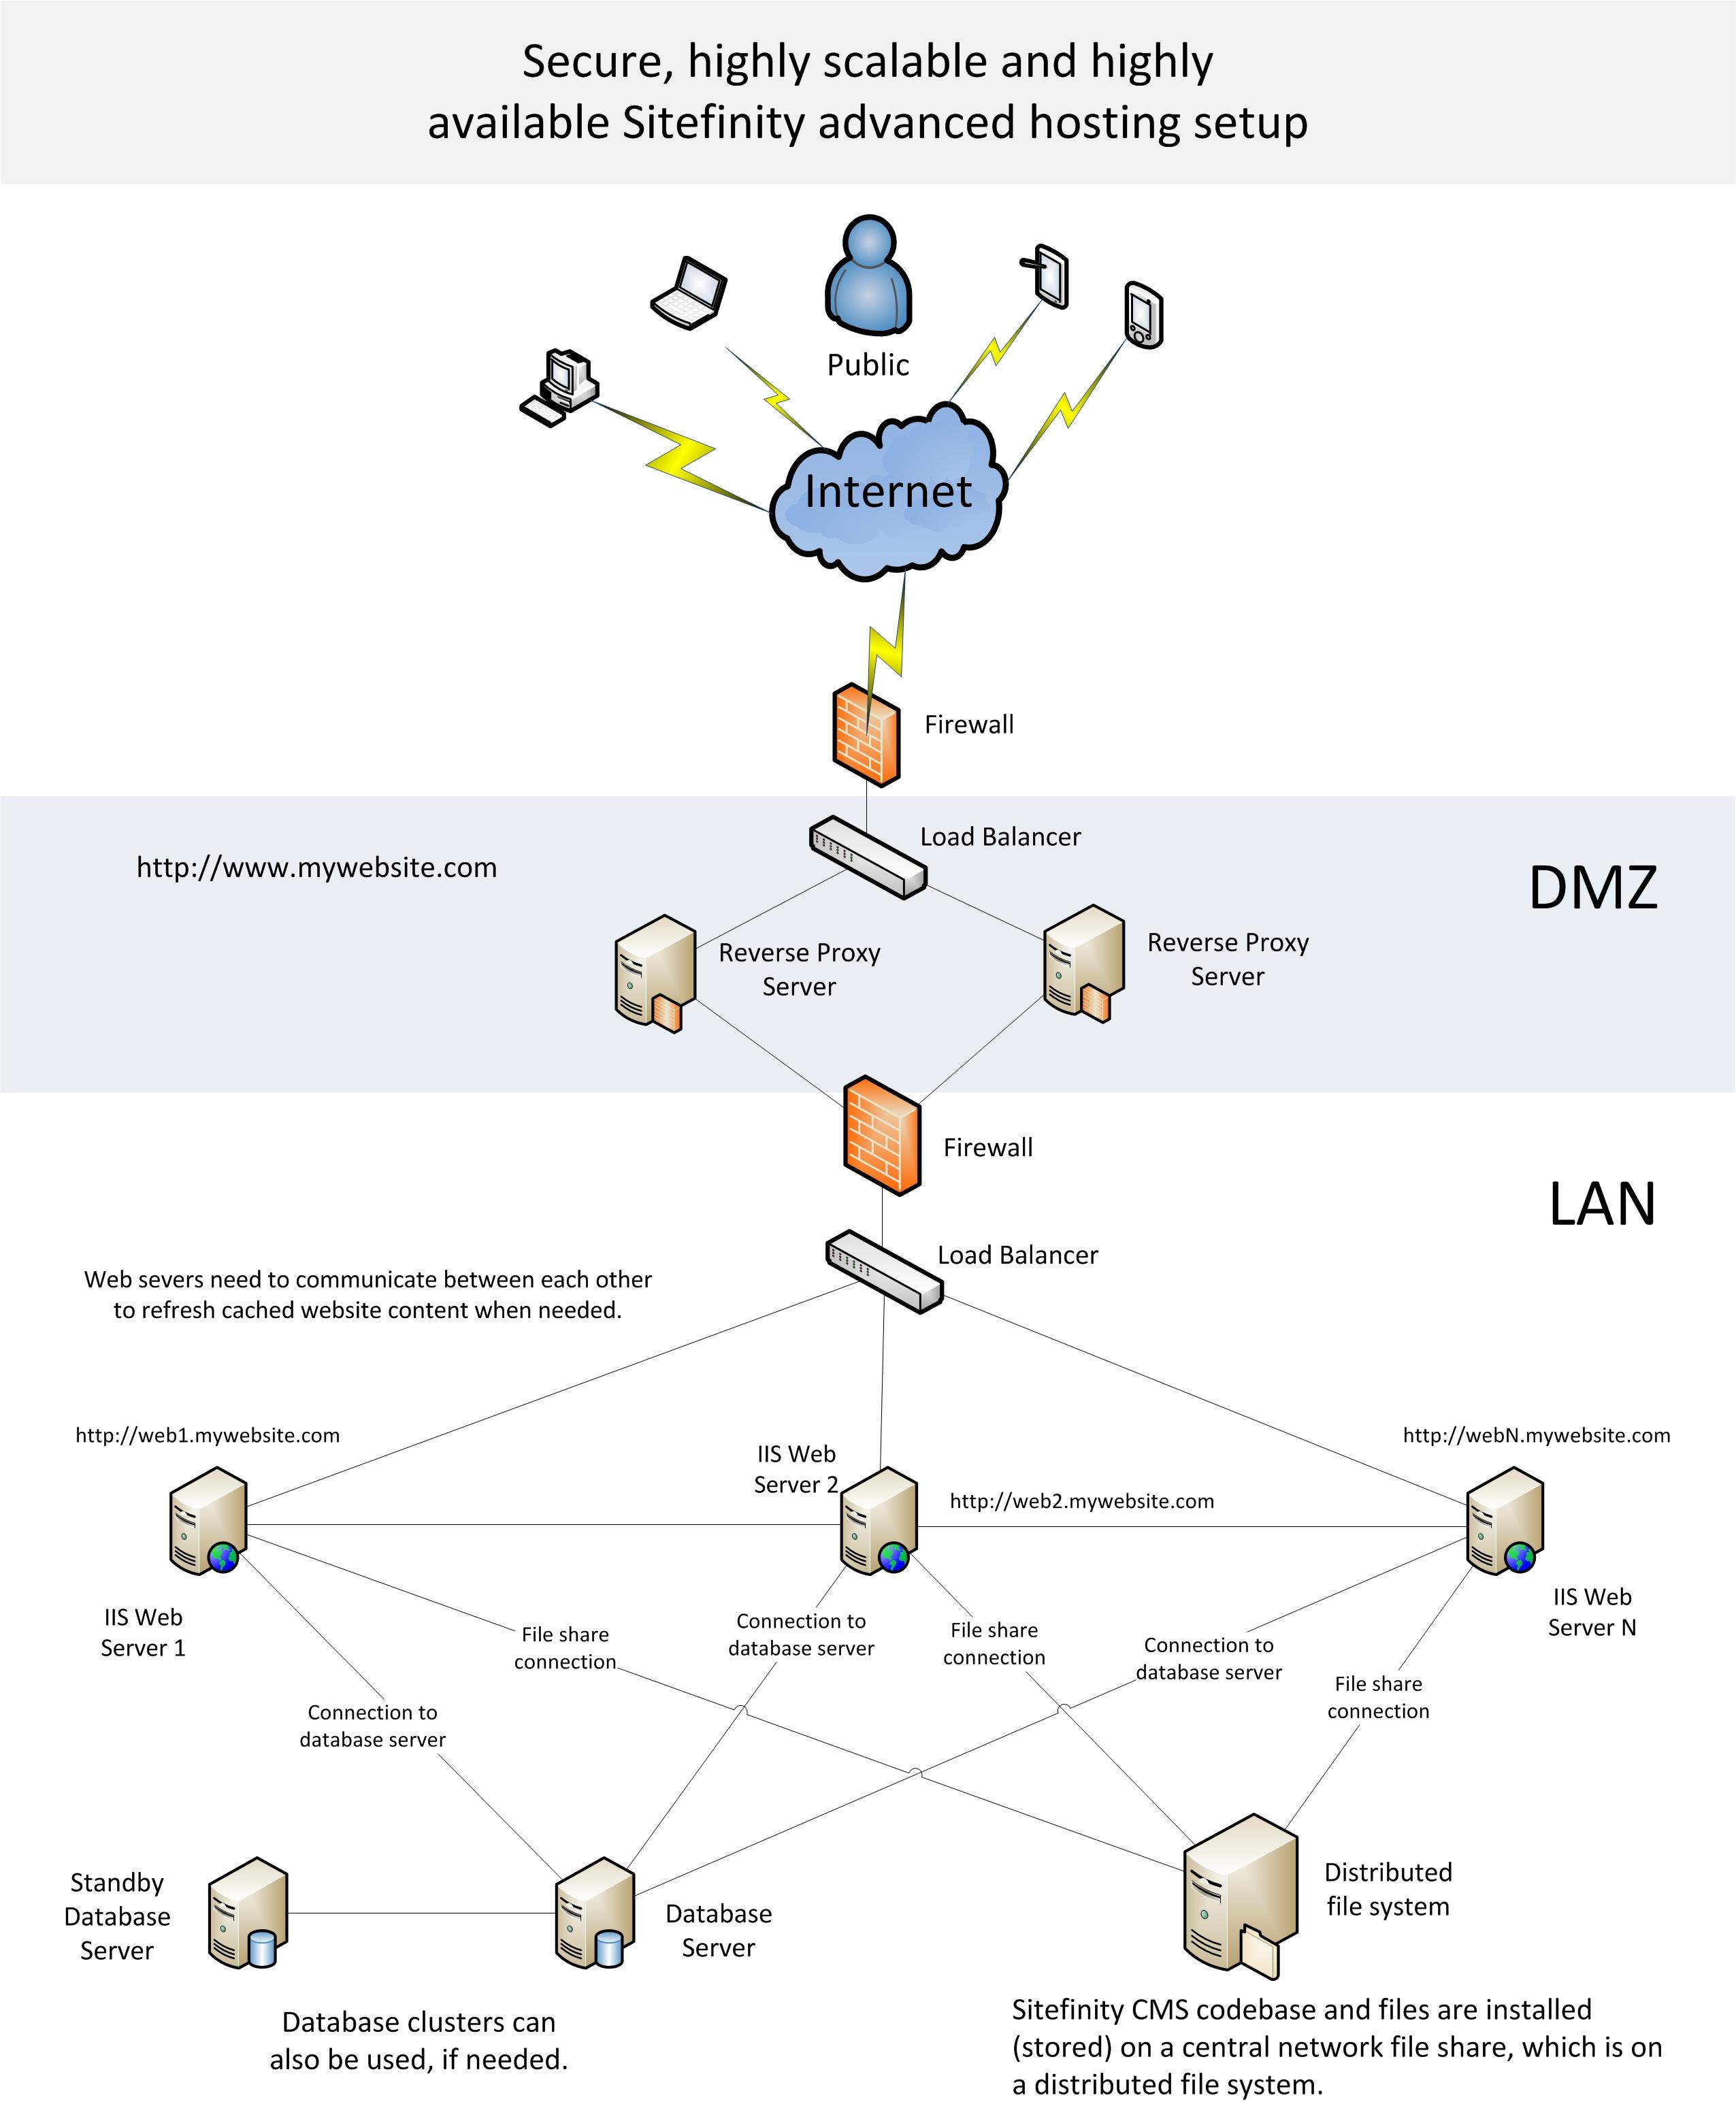 Sitefinity advanced hosting setup